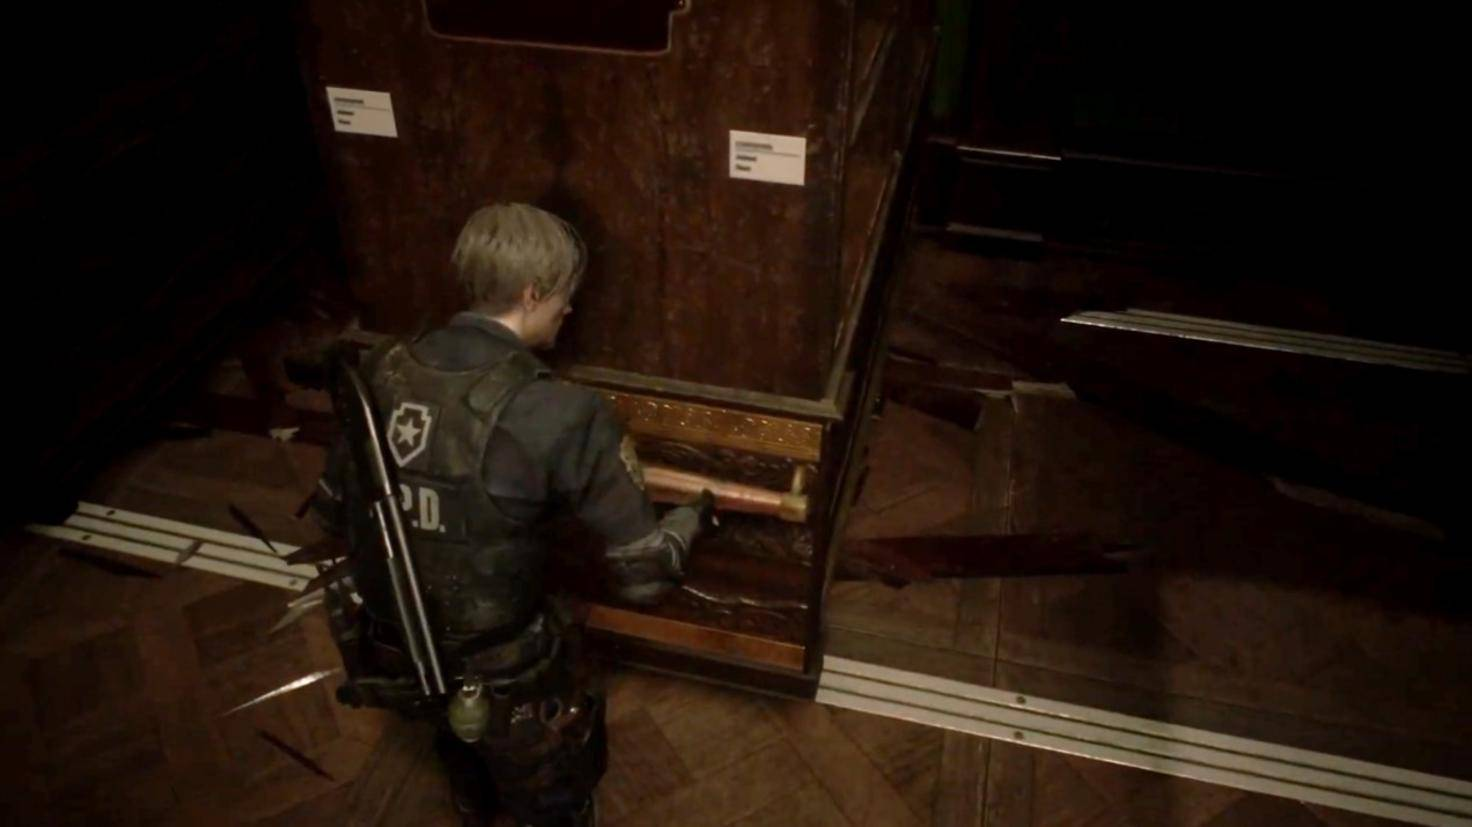 resident-evil-2-remake-bibliothek-rätsel-screenshot